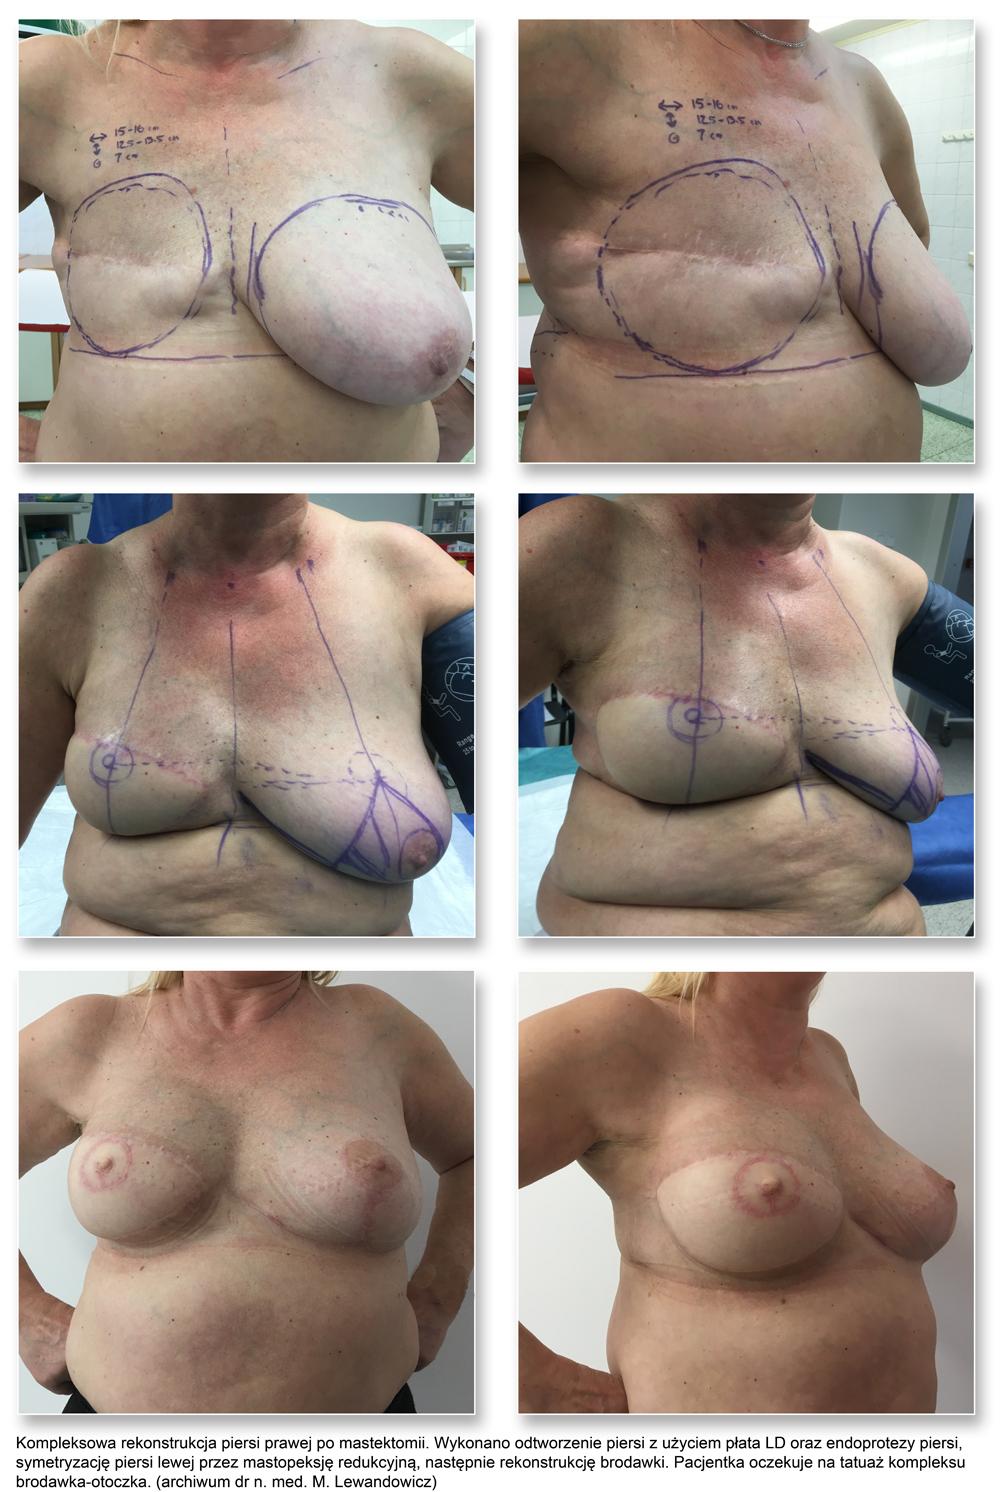 plas pier 12rec sym NAC - Rekonstrukcja piersi